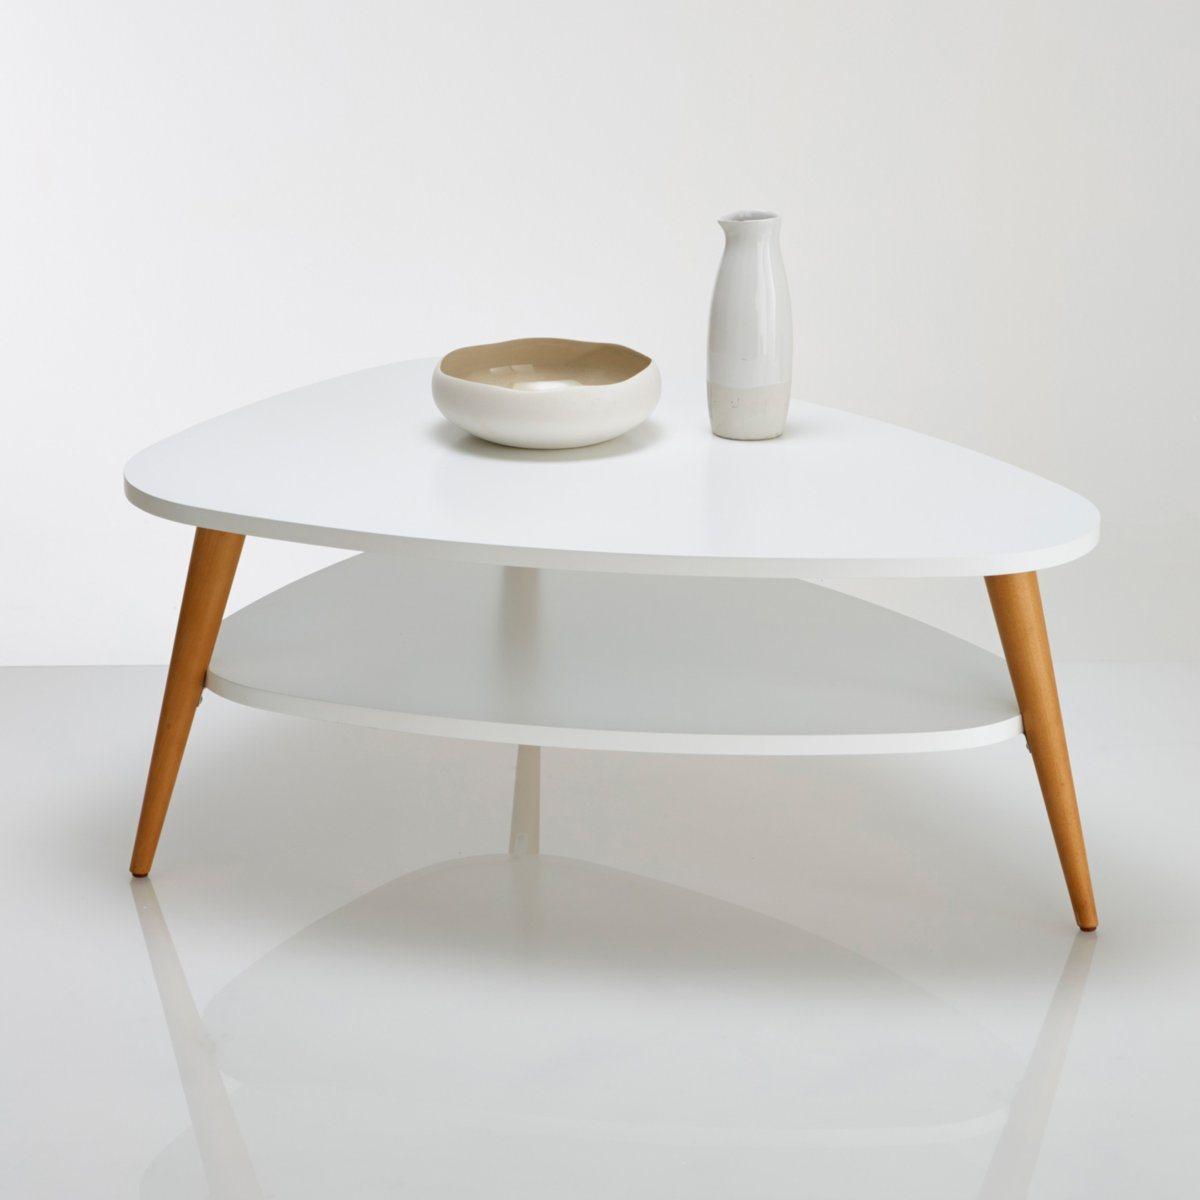 Table basse siwa alinéa